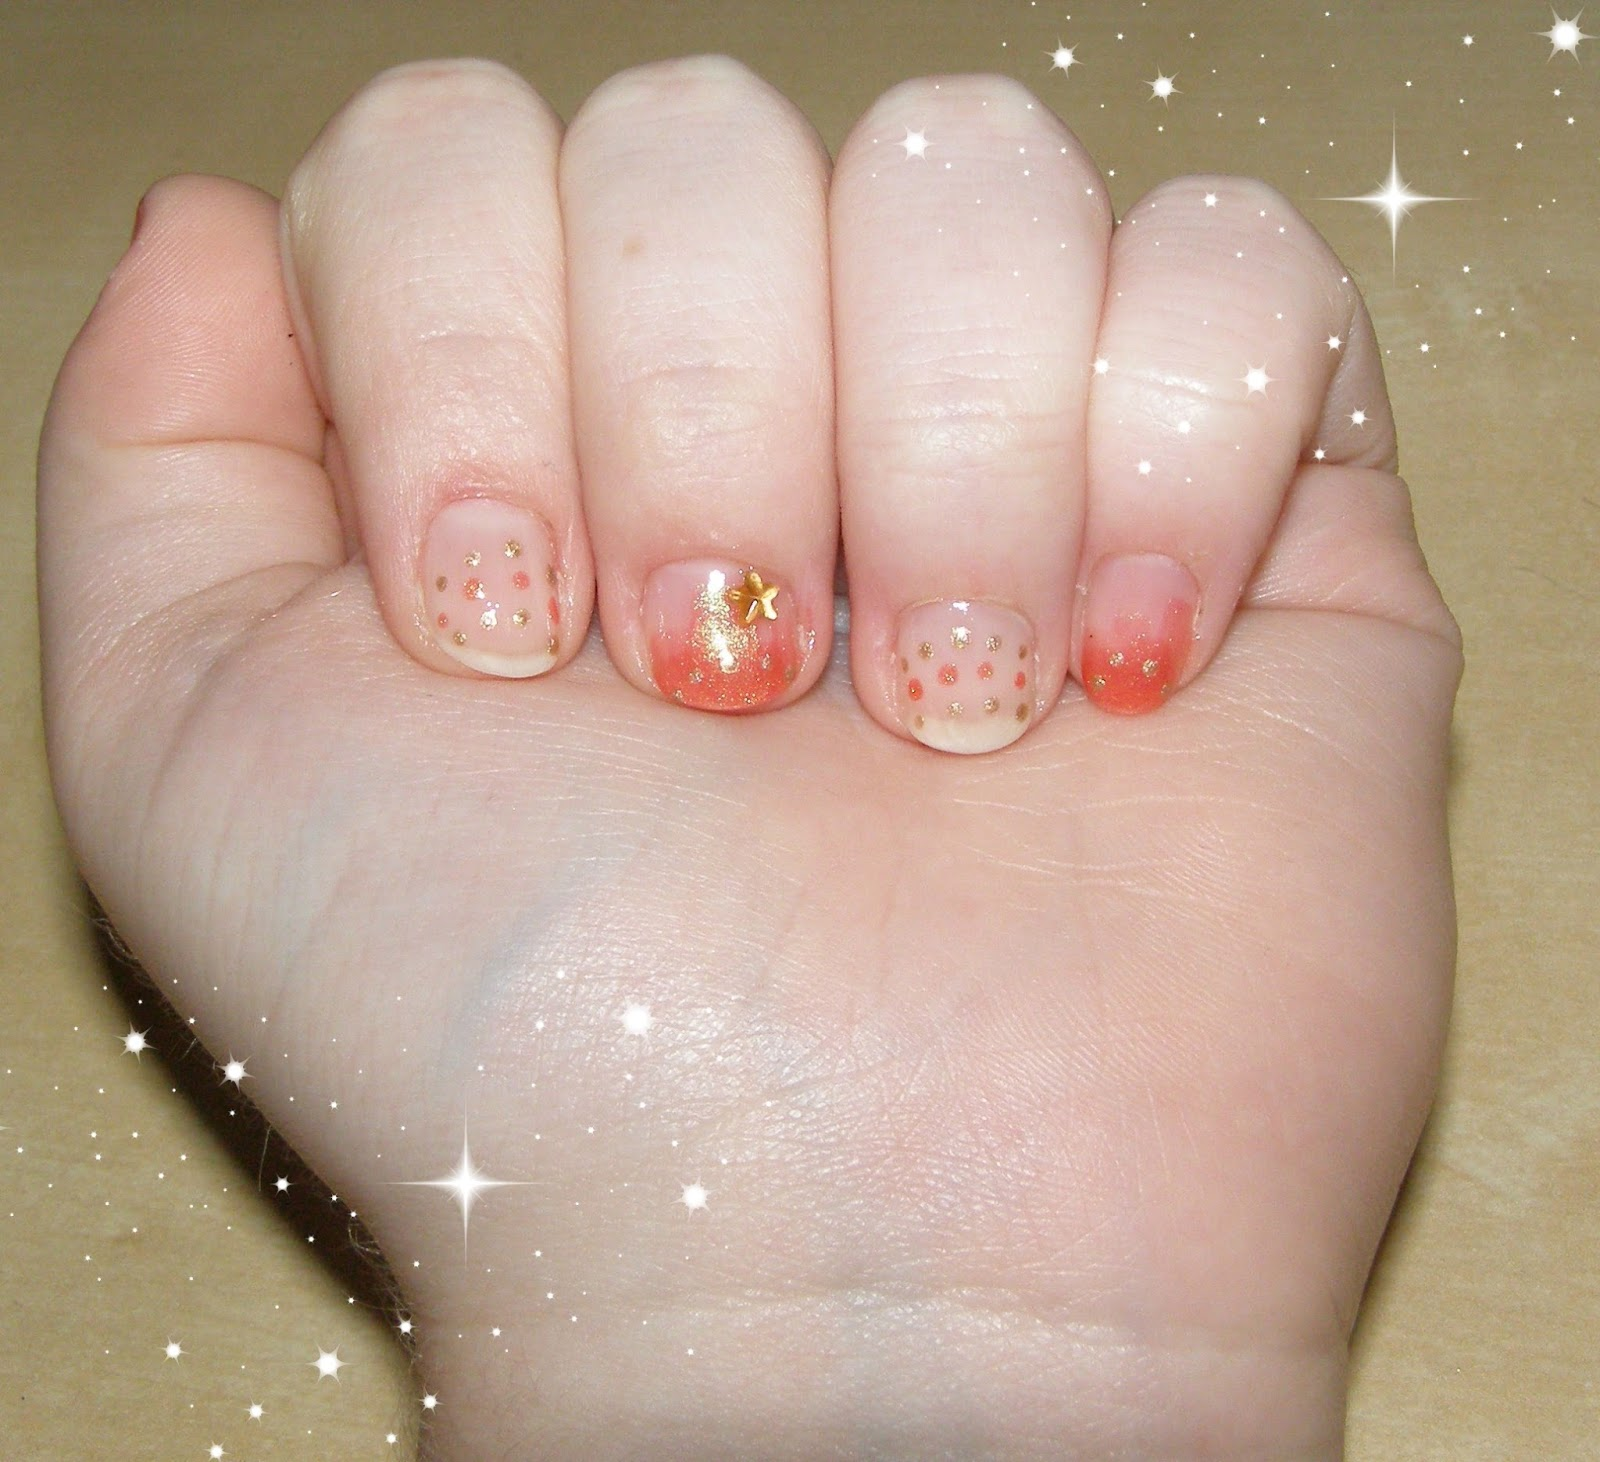 Alluring Alyss Beauty *:・゚✧: Fire Fairy Nail Art~!